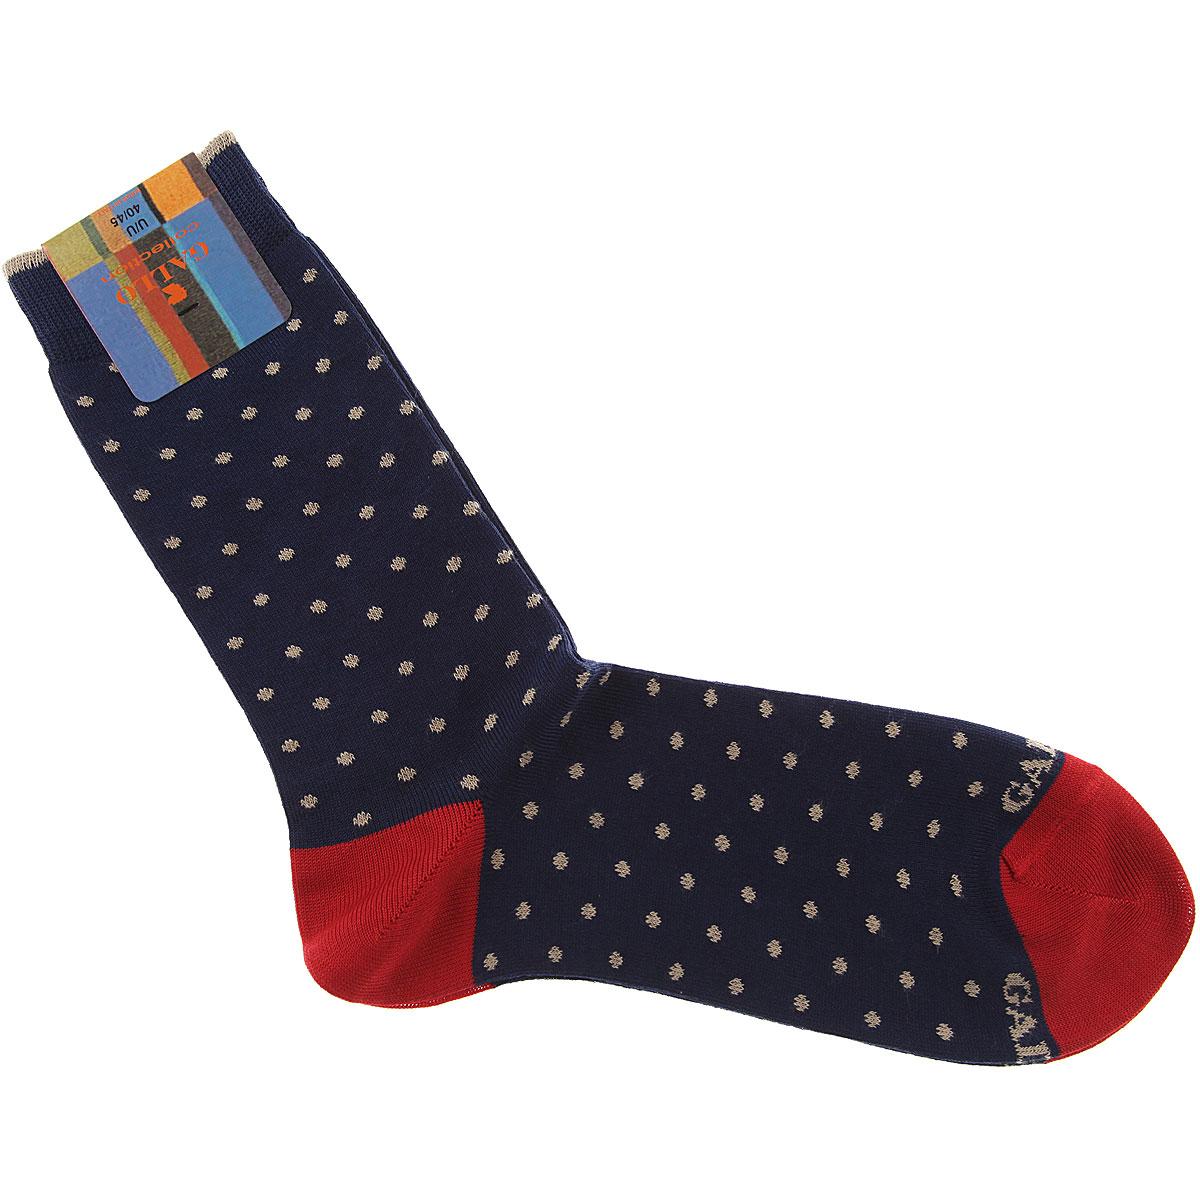 86cb34cc8d Mens Underwear Gallo Socks, Style code: ap103614-12721-